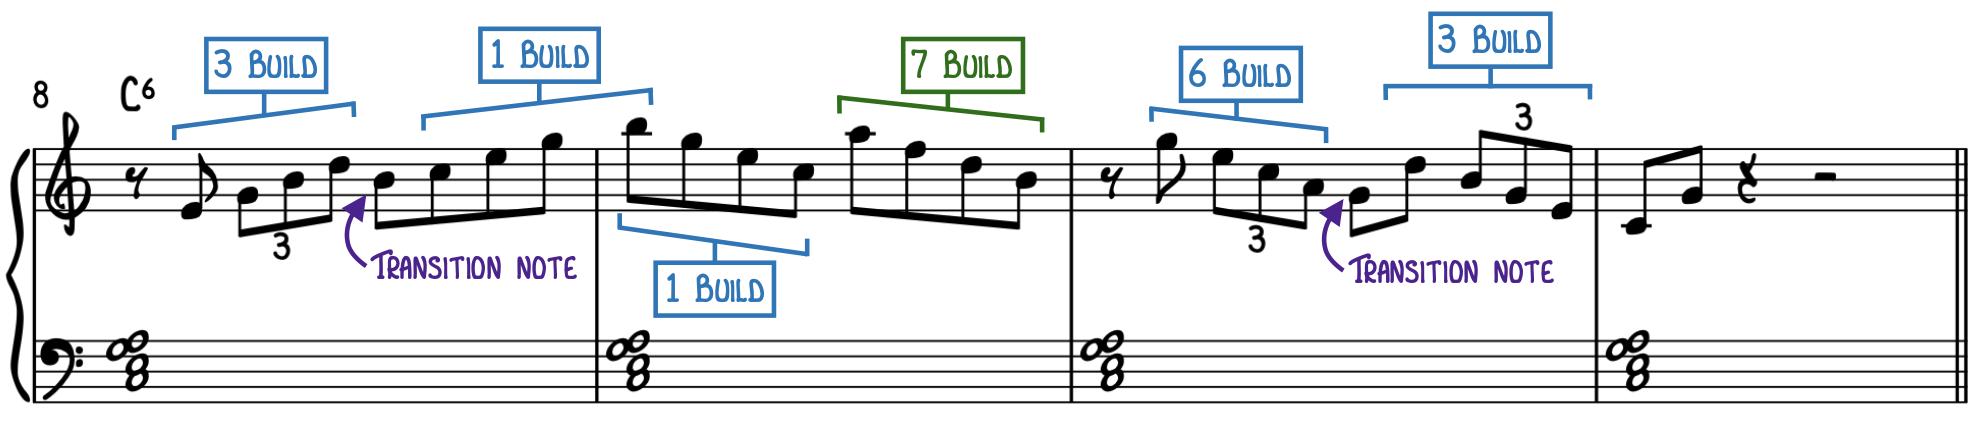 Solo Example 1